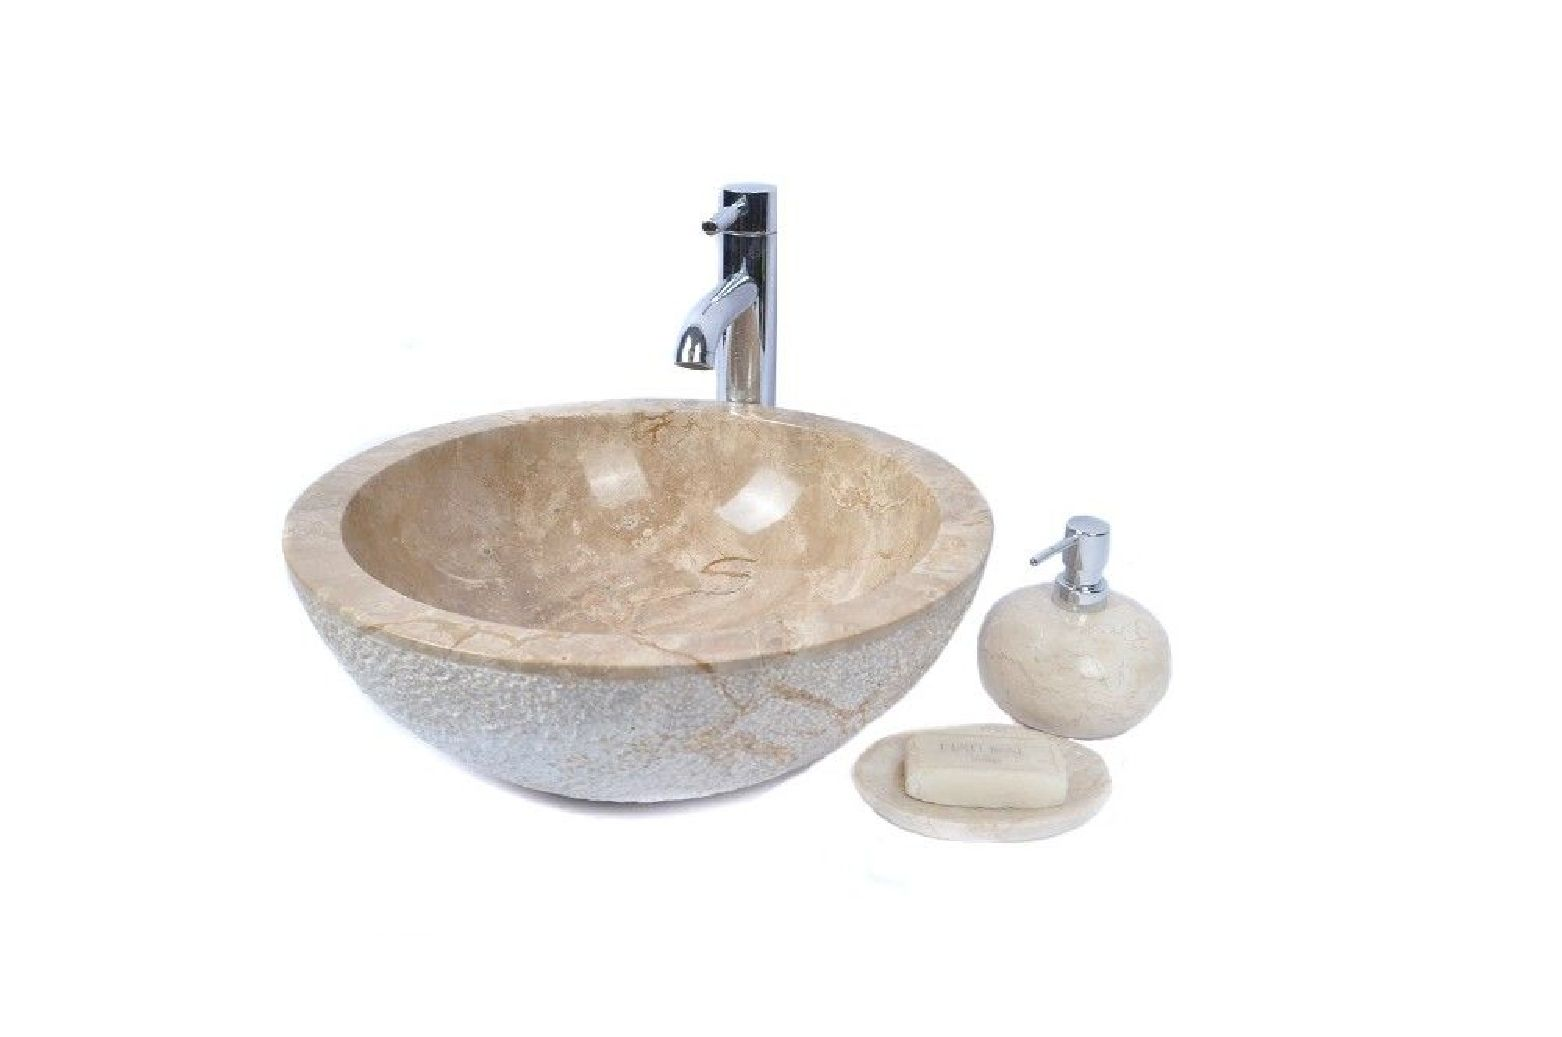 Kc-d brown e 40 cm wash basin overtop